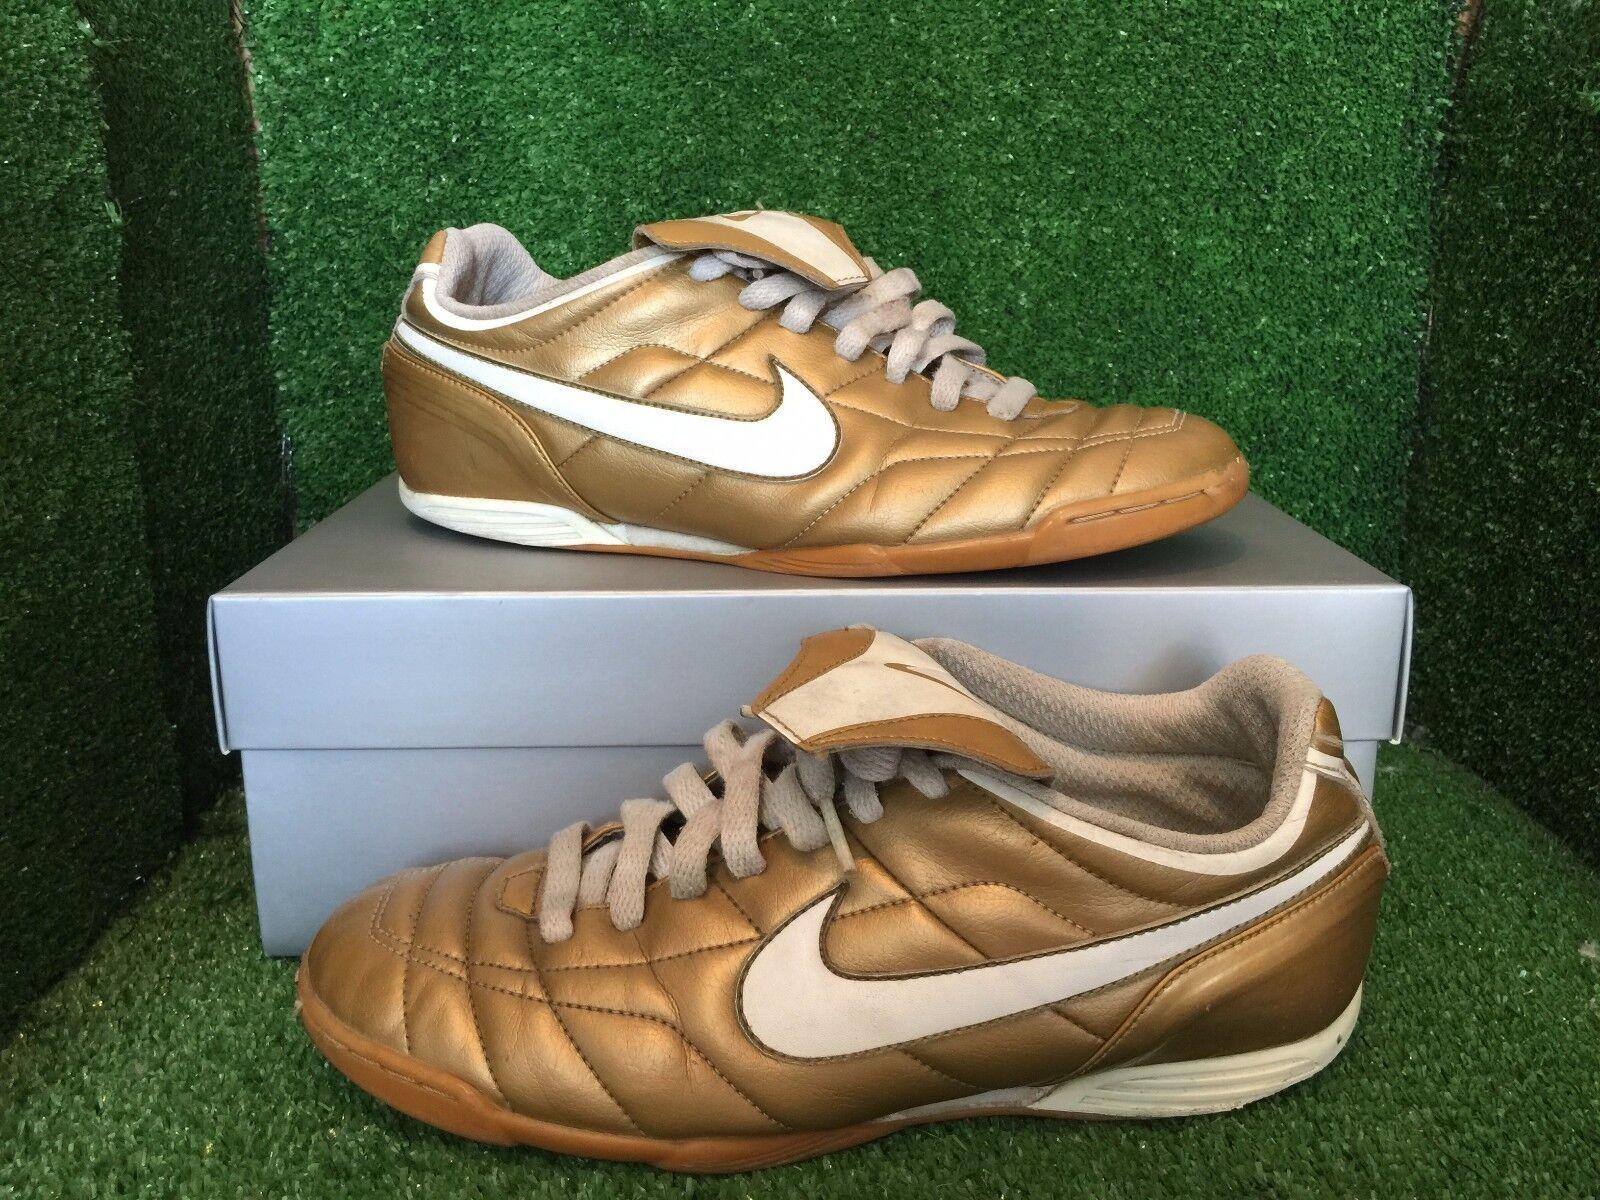 NIKE TIEMPO Indoor R10 RONALDINHO gold T90 Size 8,5 7,5 42